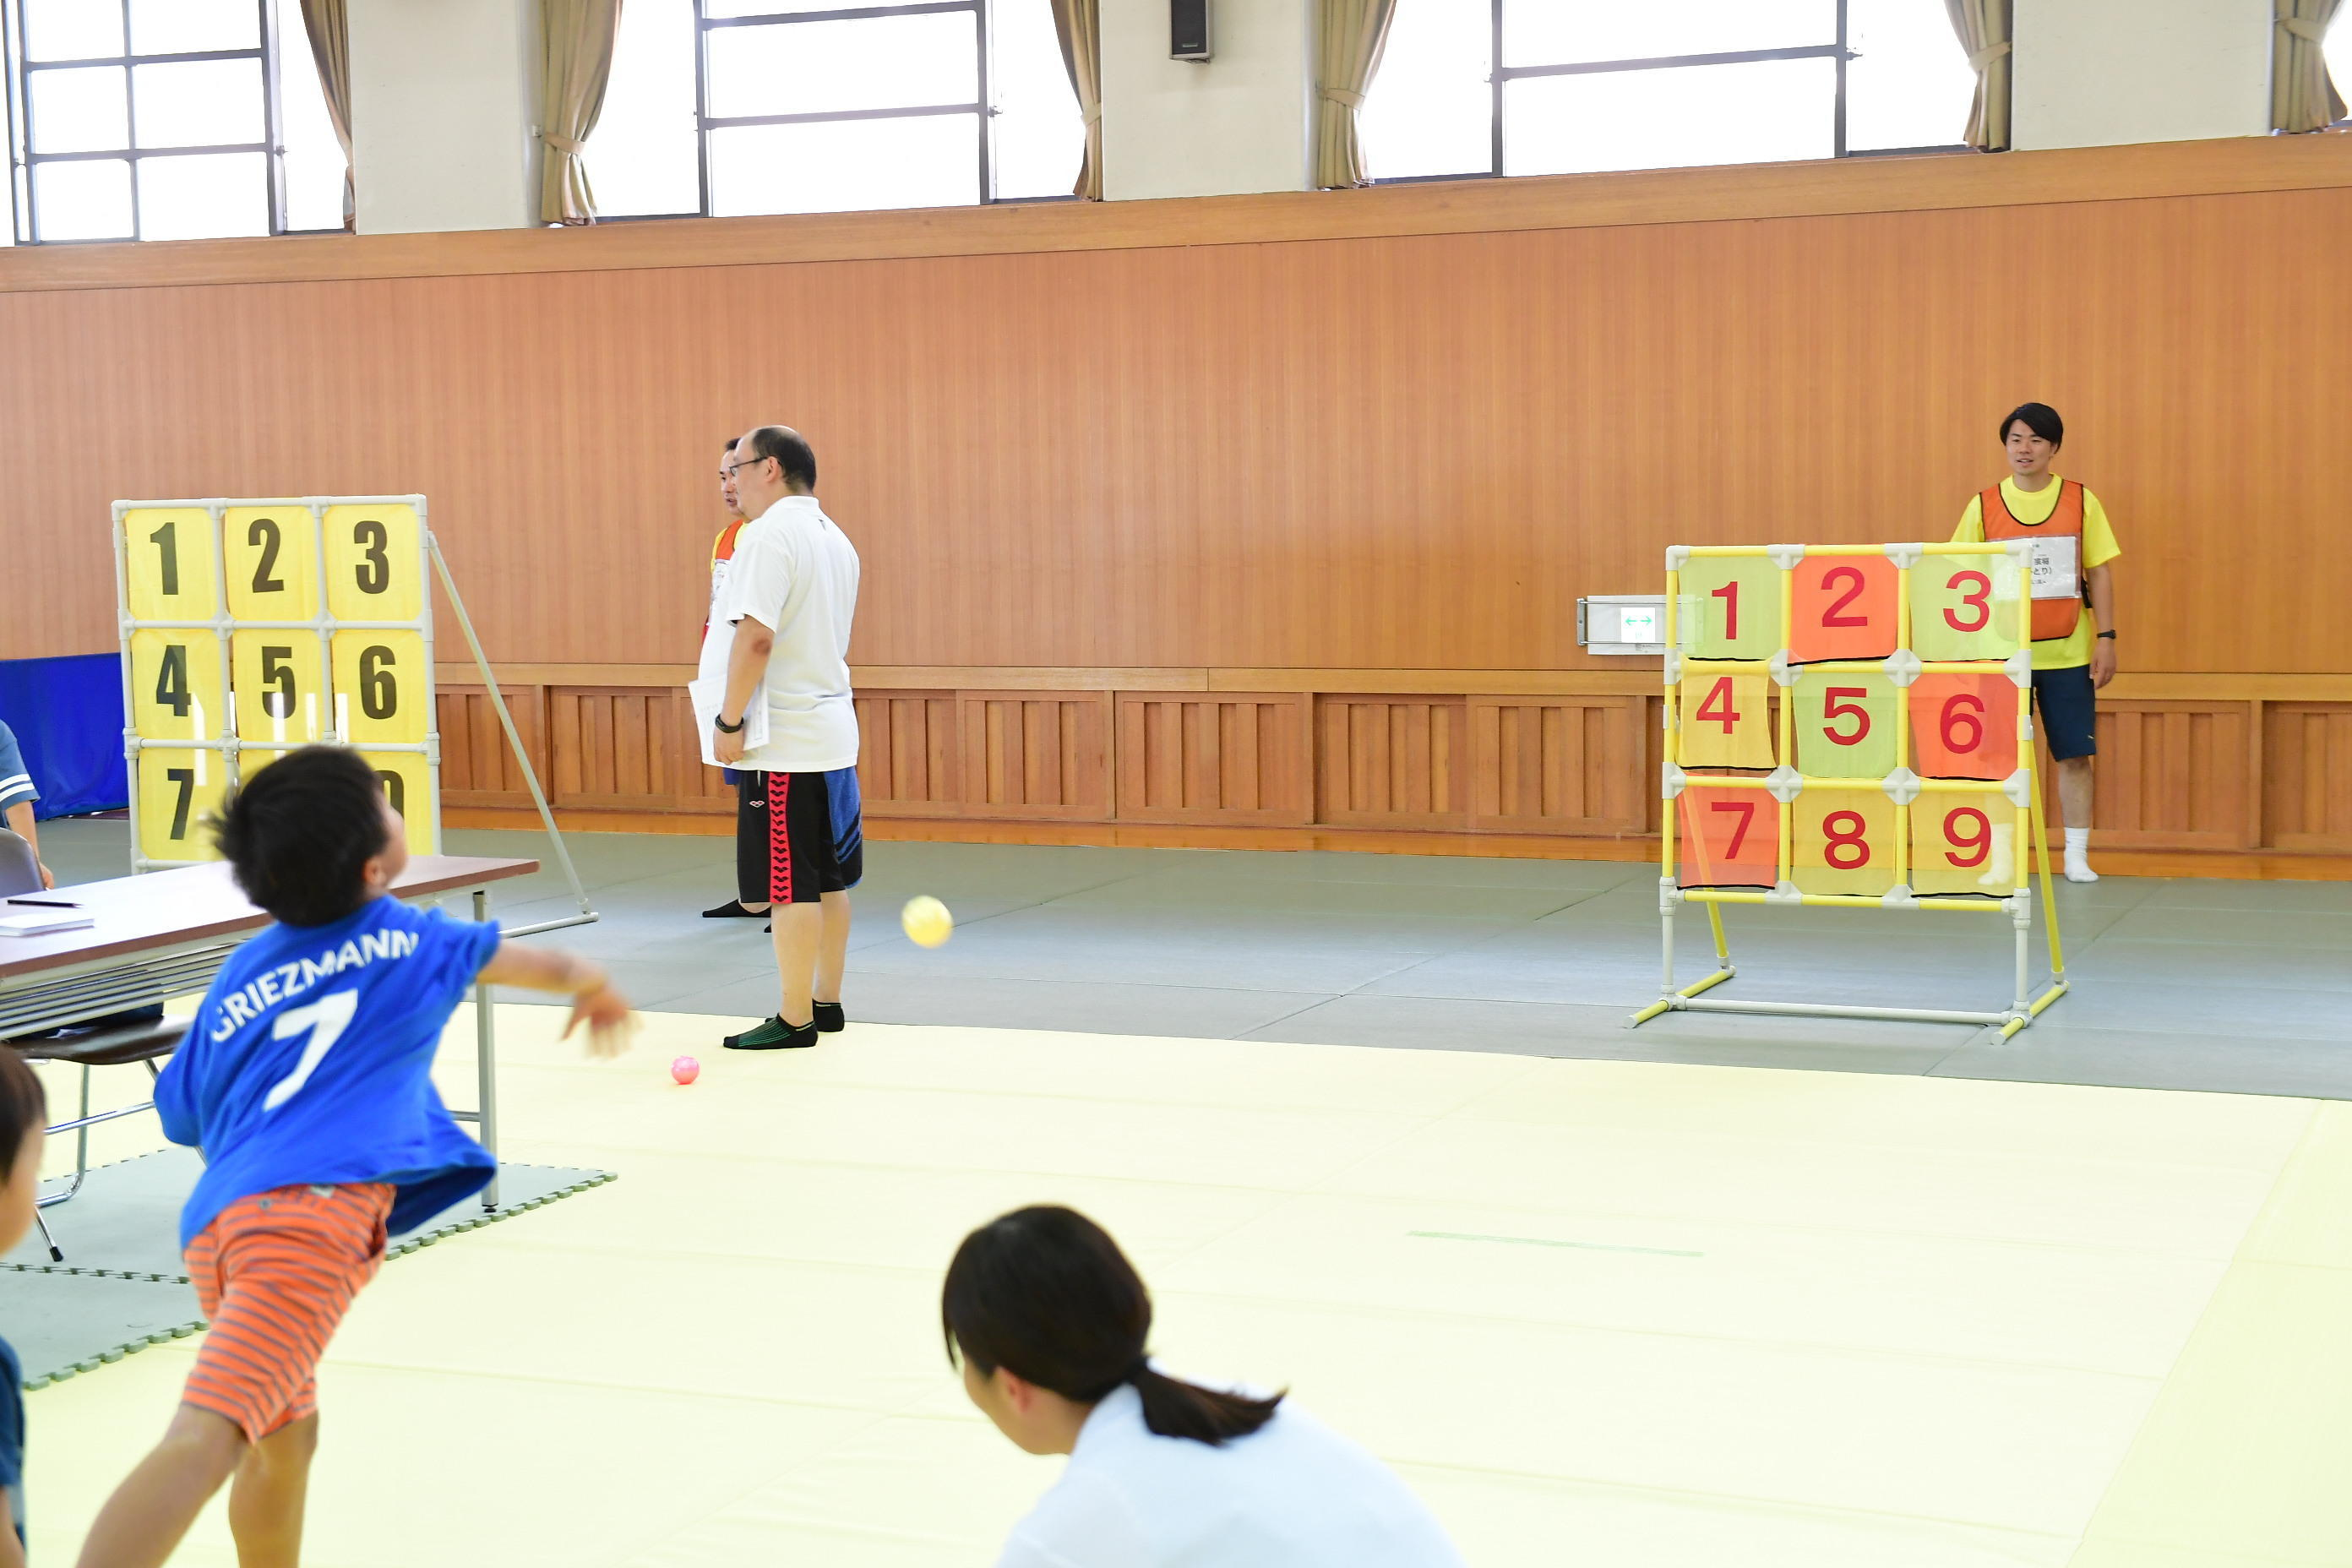 http://news.yoshimoto.co.jp/20181008190838-5847ea83cabe53a146f25a21b664257856a7858e.jpg